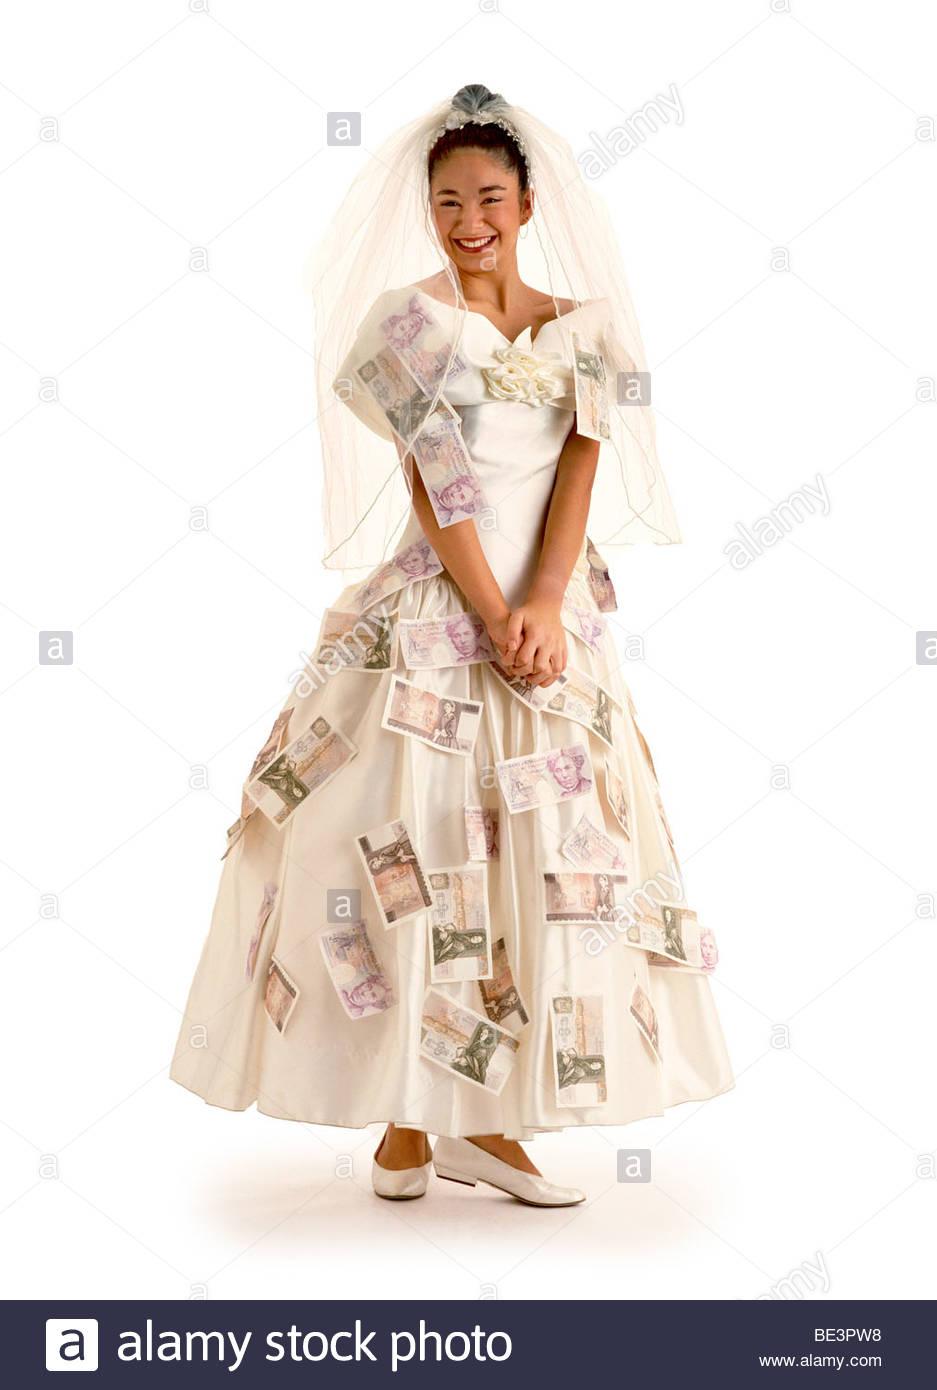 Greek Bride Money Stockfotos & Greek Bride Money Bilder - Alamy